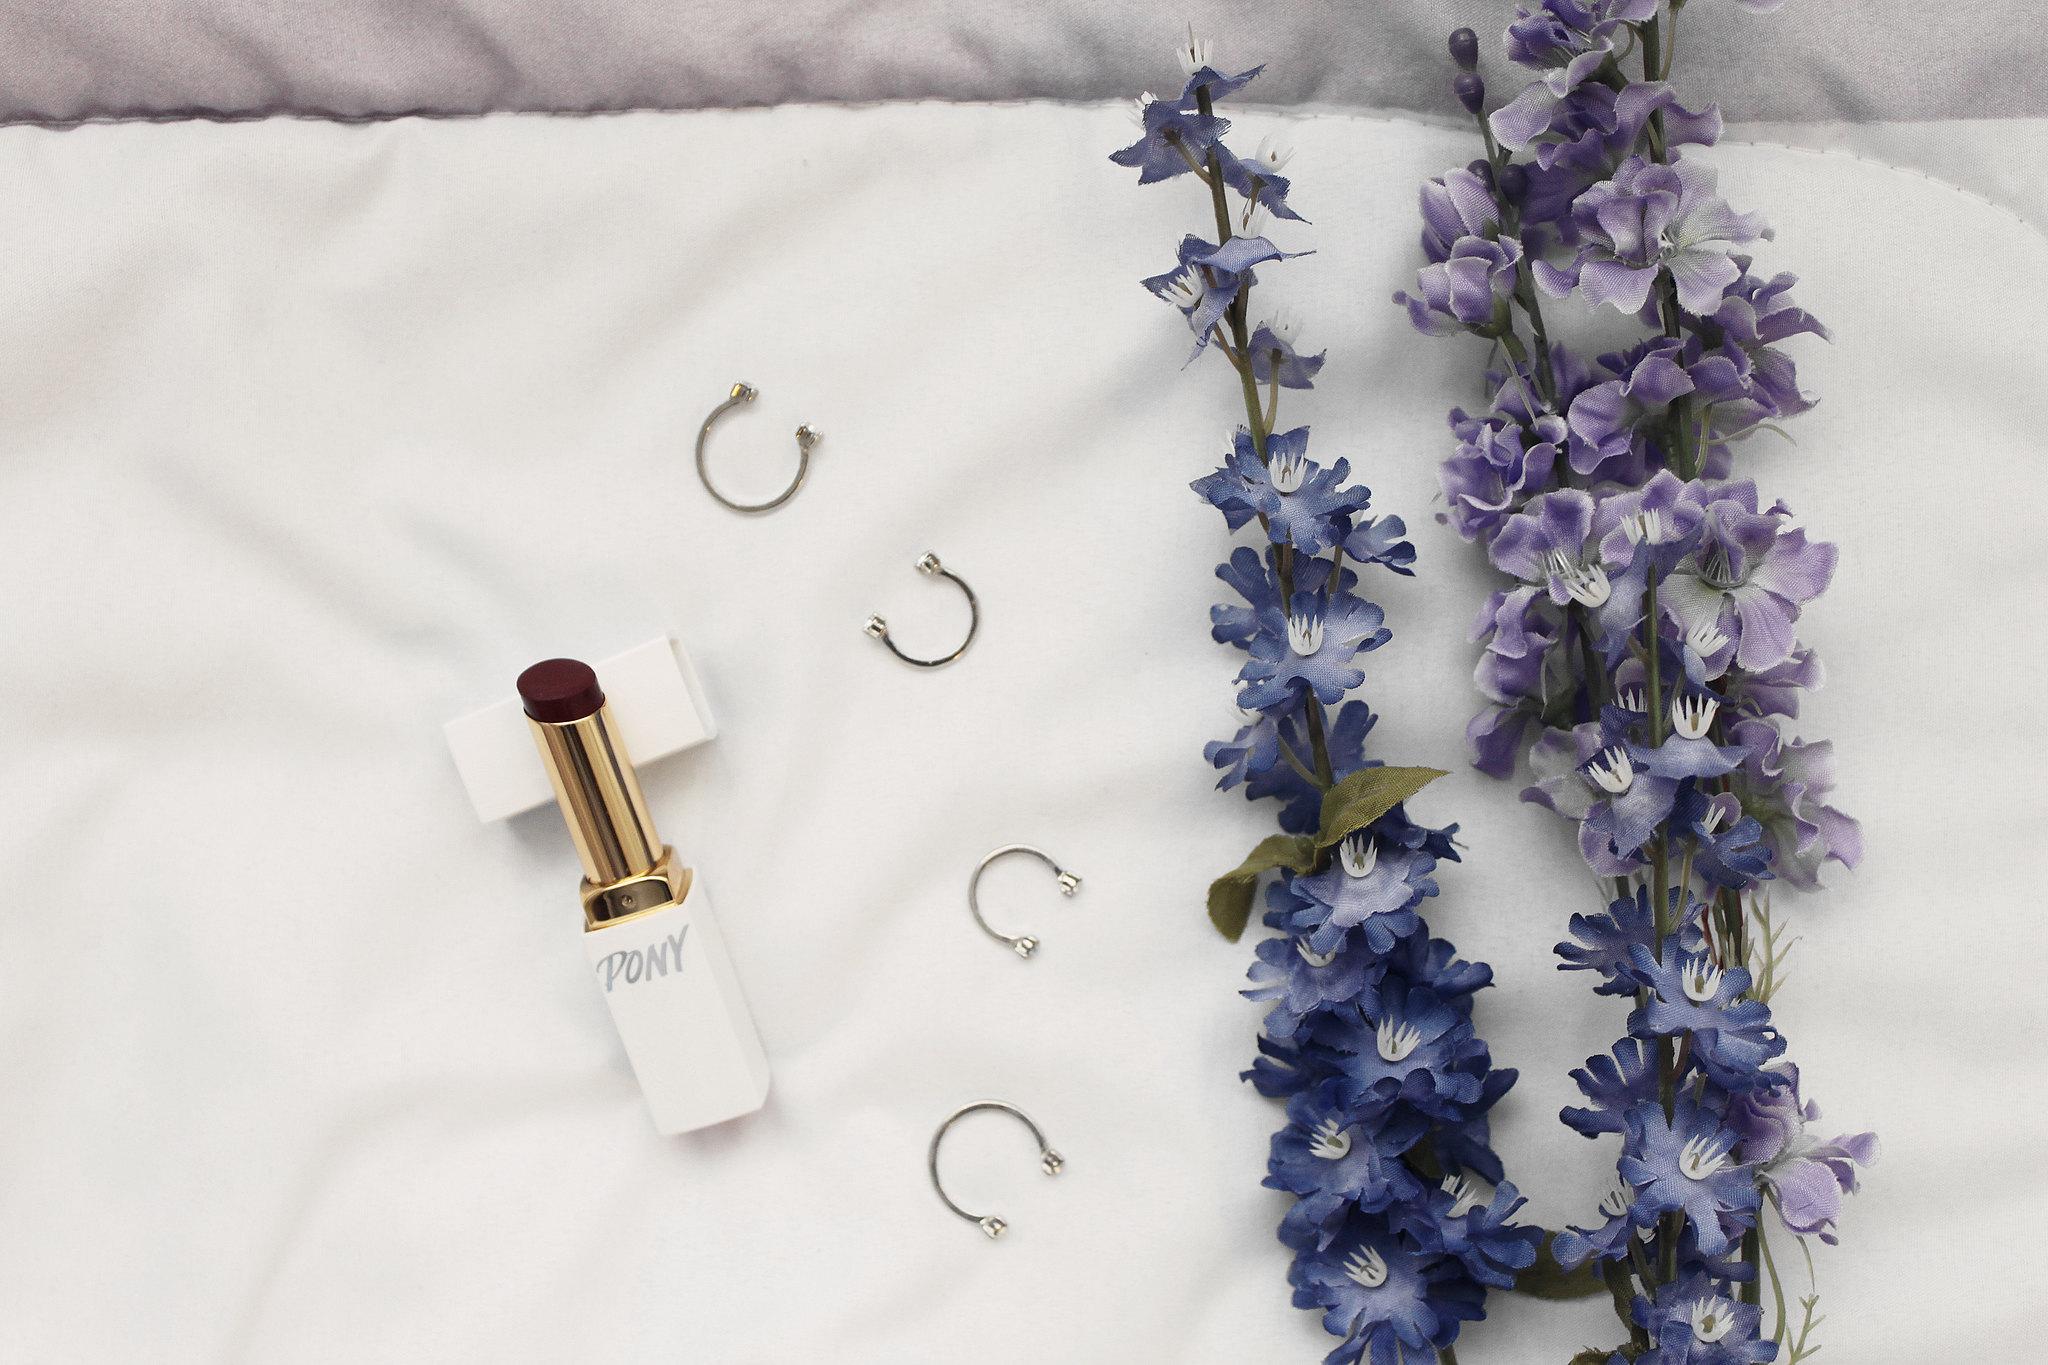 5763-beauty-makeup-skincare-sephora-vibrouge-ponymakeup-pony-lipstick-clothestoyouuu-elizabeeetht-flatlay